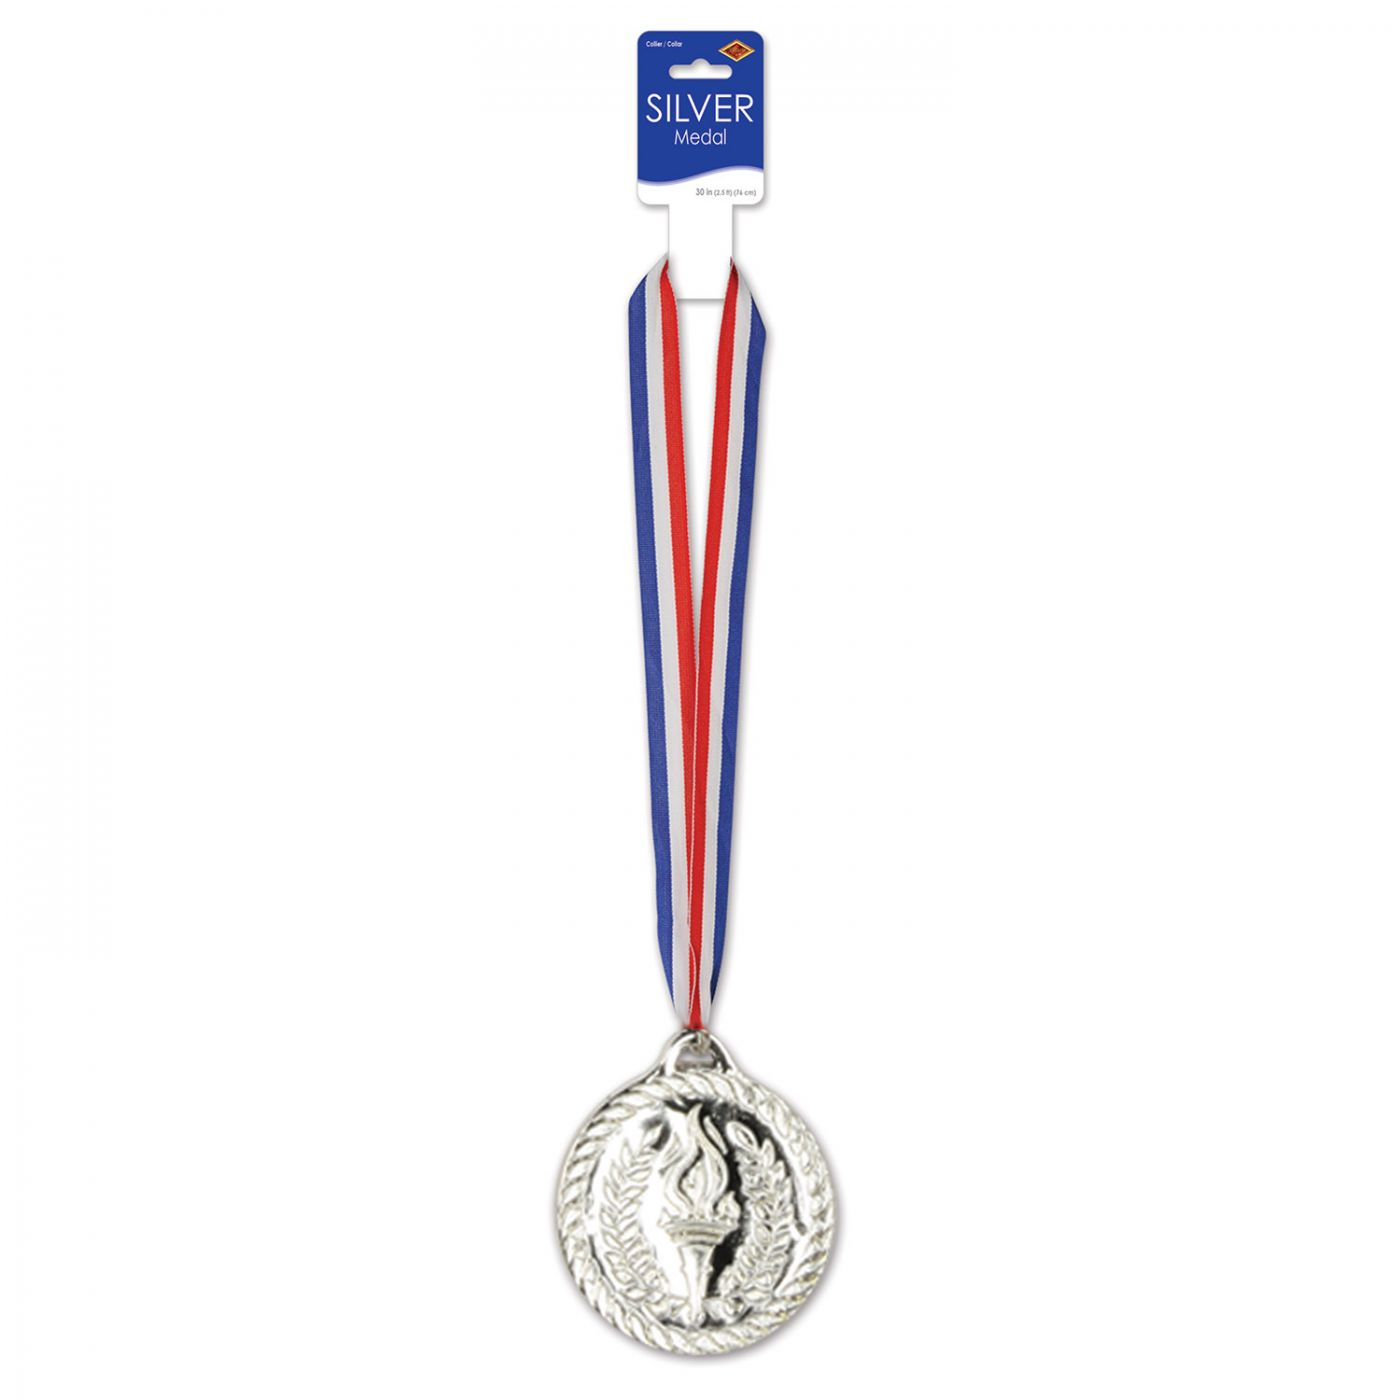 Silver Medal w/Ribbon image